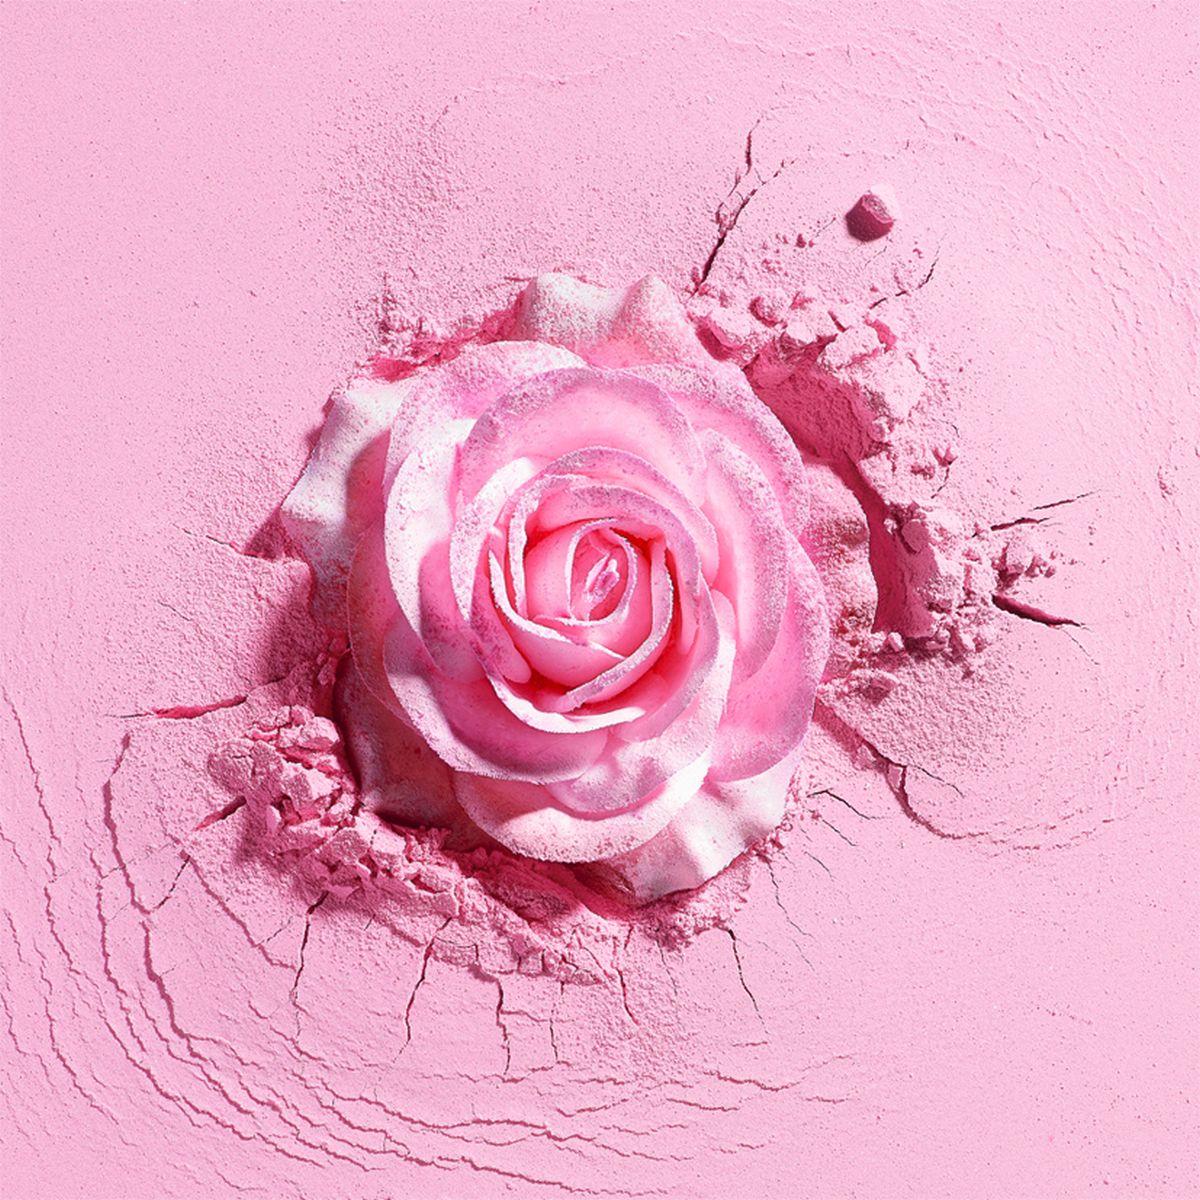 web_spring-2017-visuel-secondaire-rose-focus-merch-hd261016-5mb